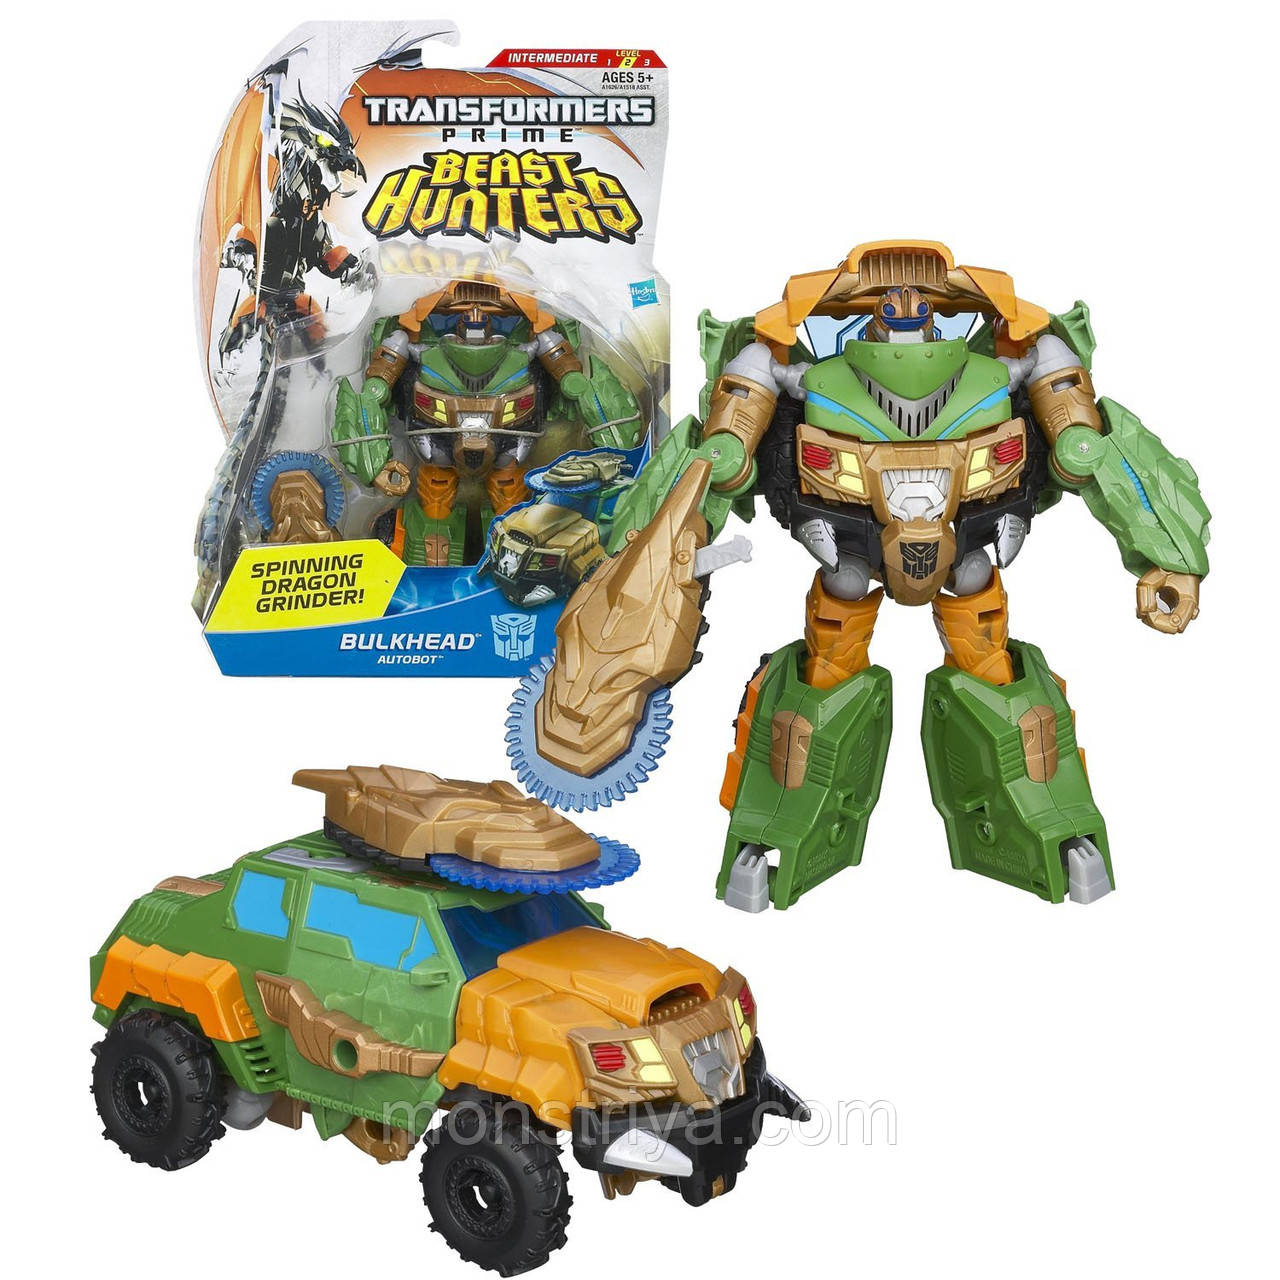 Transformers Робот Трансформер PRIME Beast Hunters Deluxe BULKHEAD